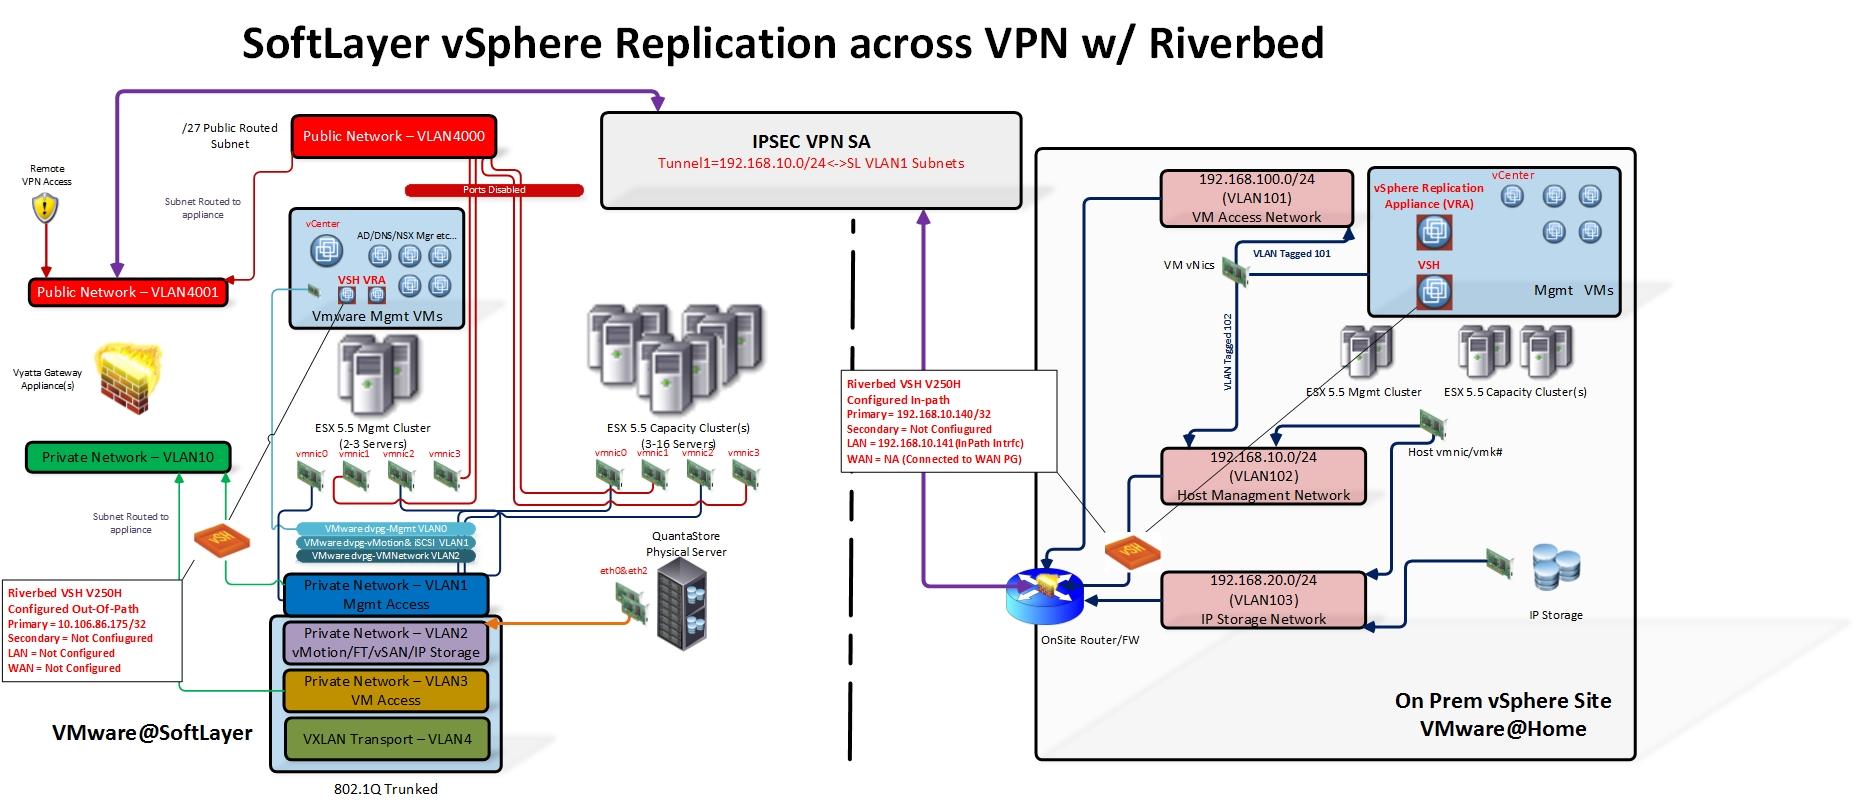 Riverbed WAN Optimization Of VSphere Replication At VMware